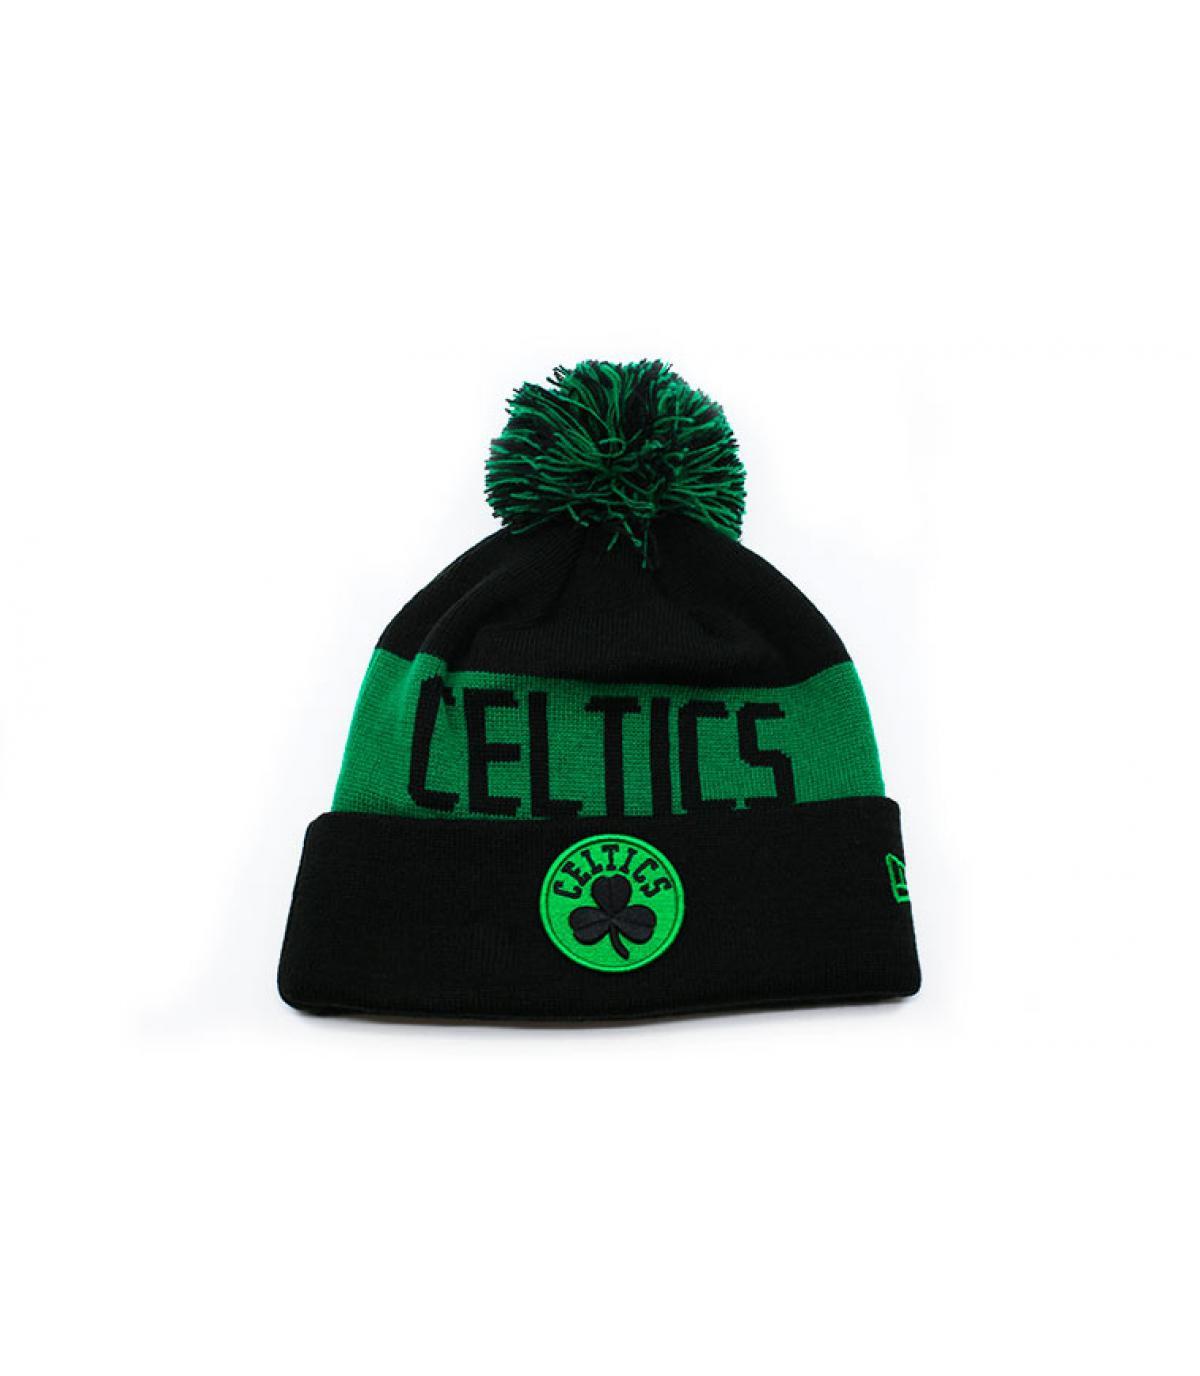 bonnet revers Celtics noir vert